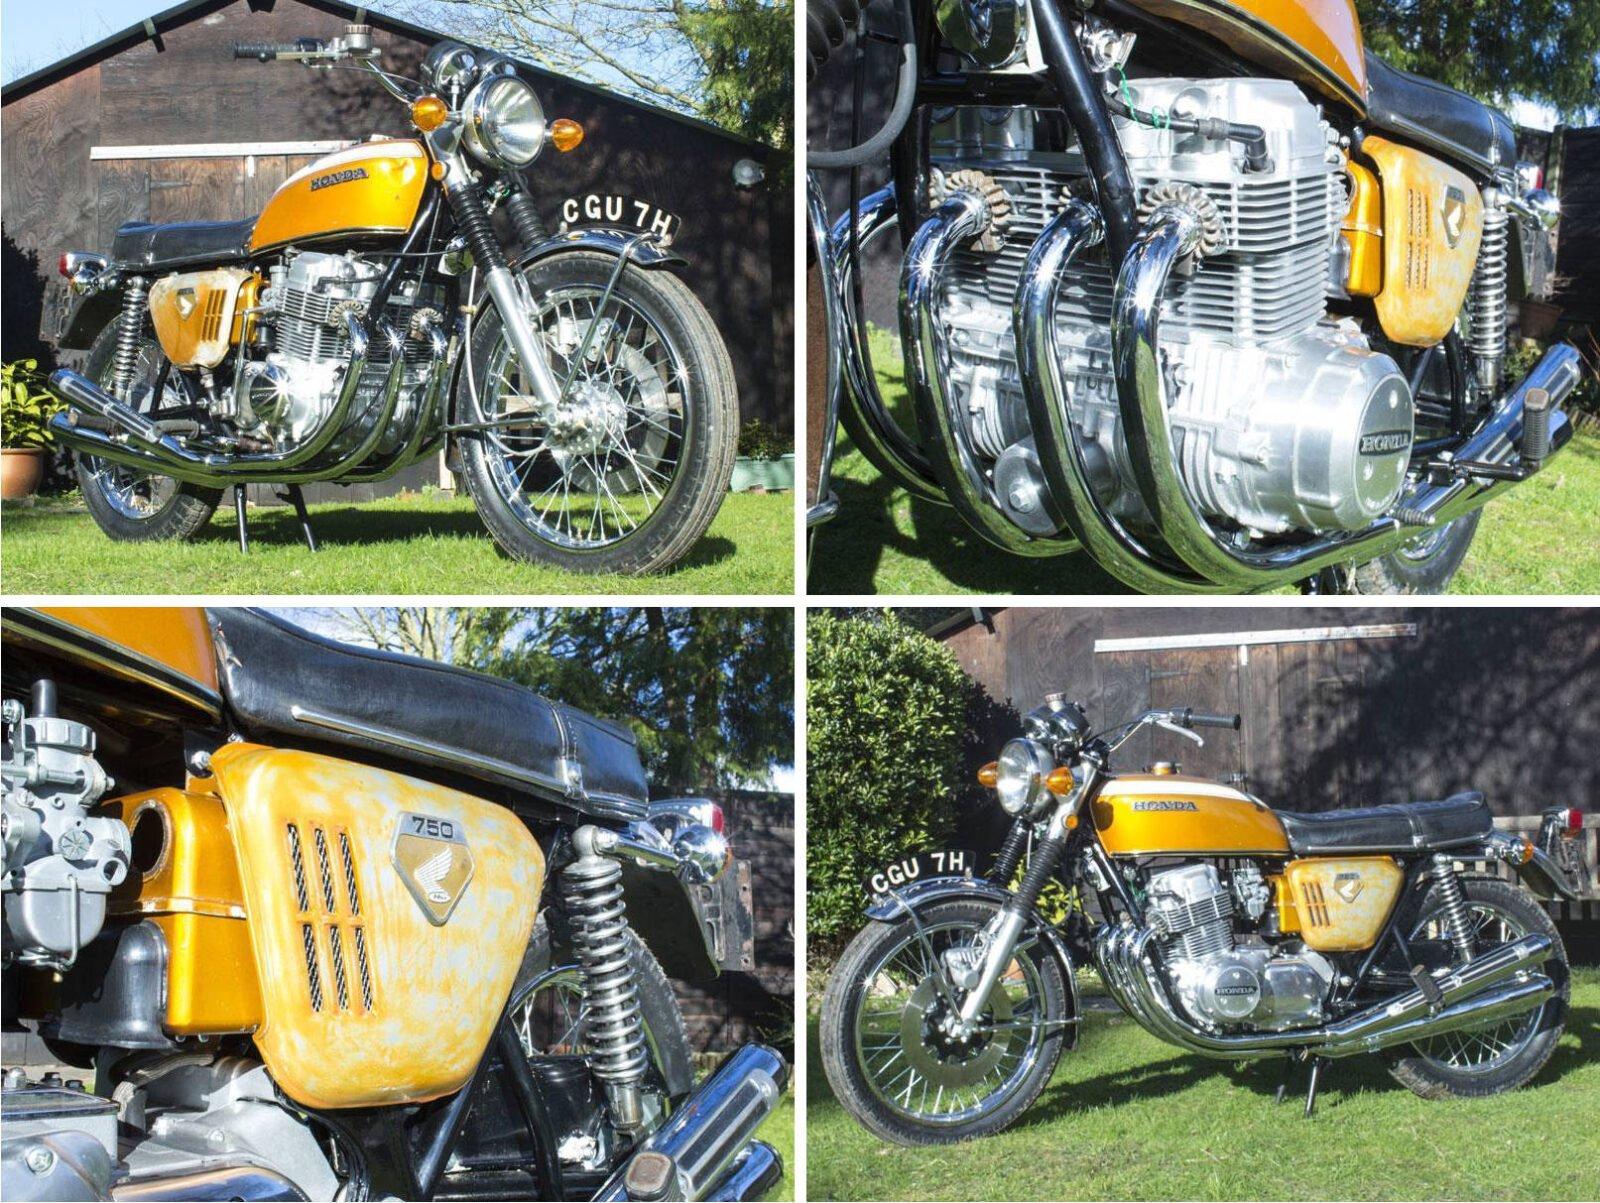 Honda CB750 Sandcast Motorcycle